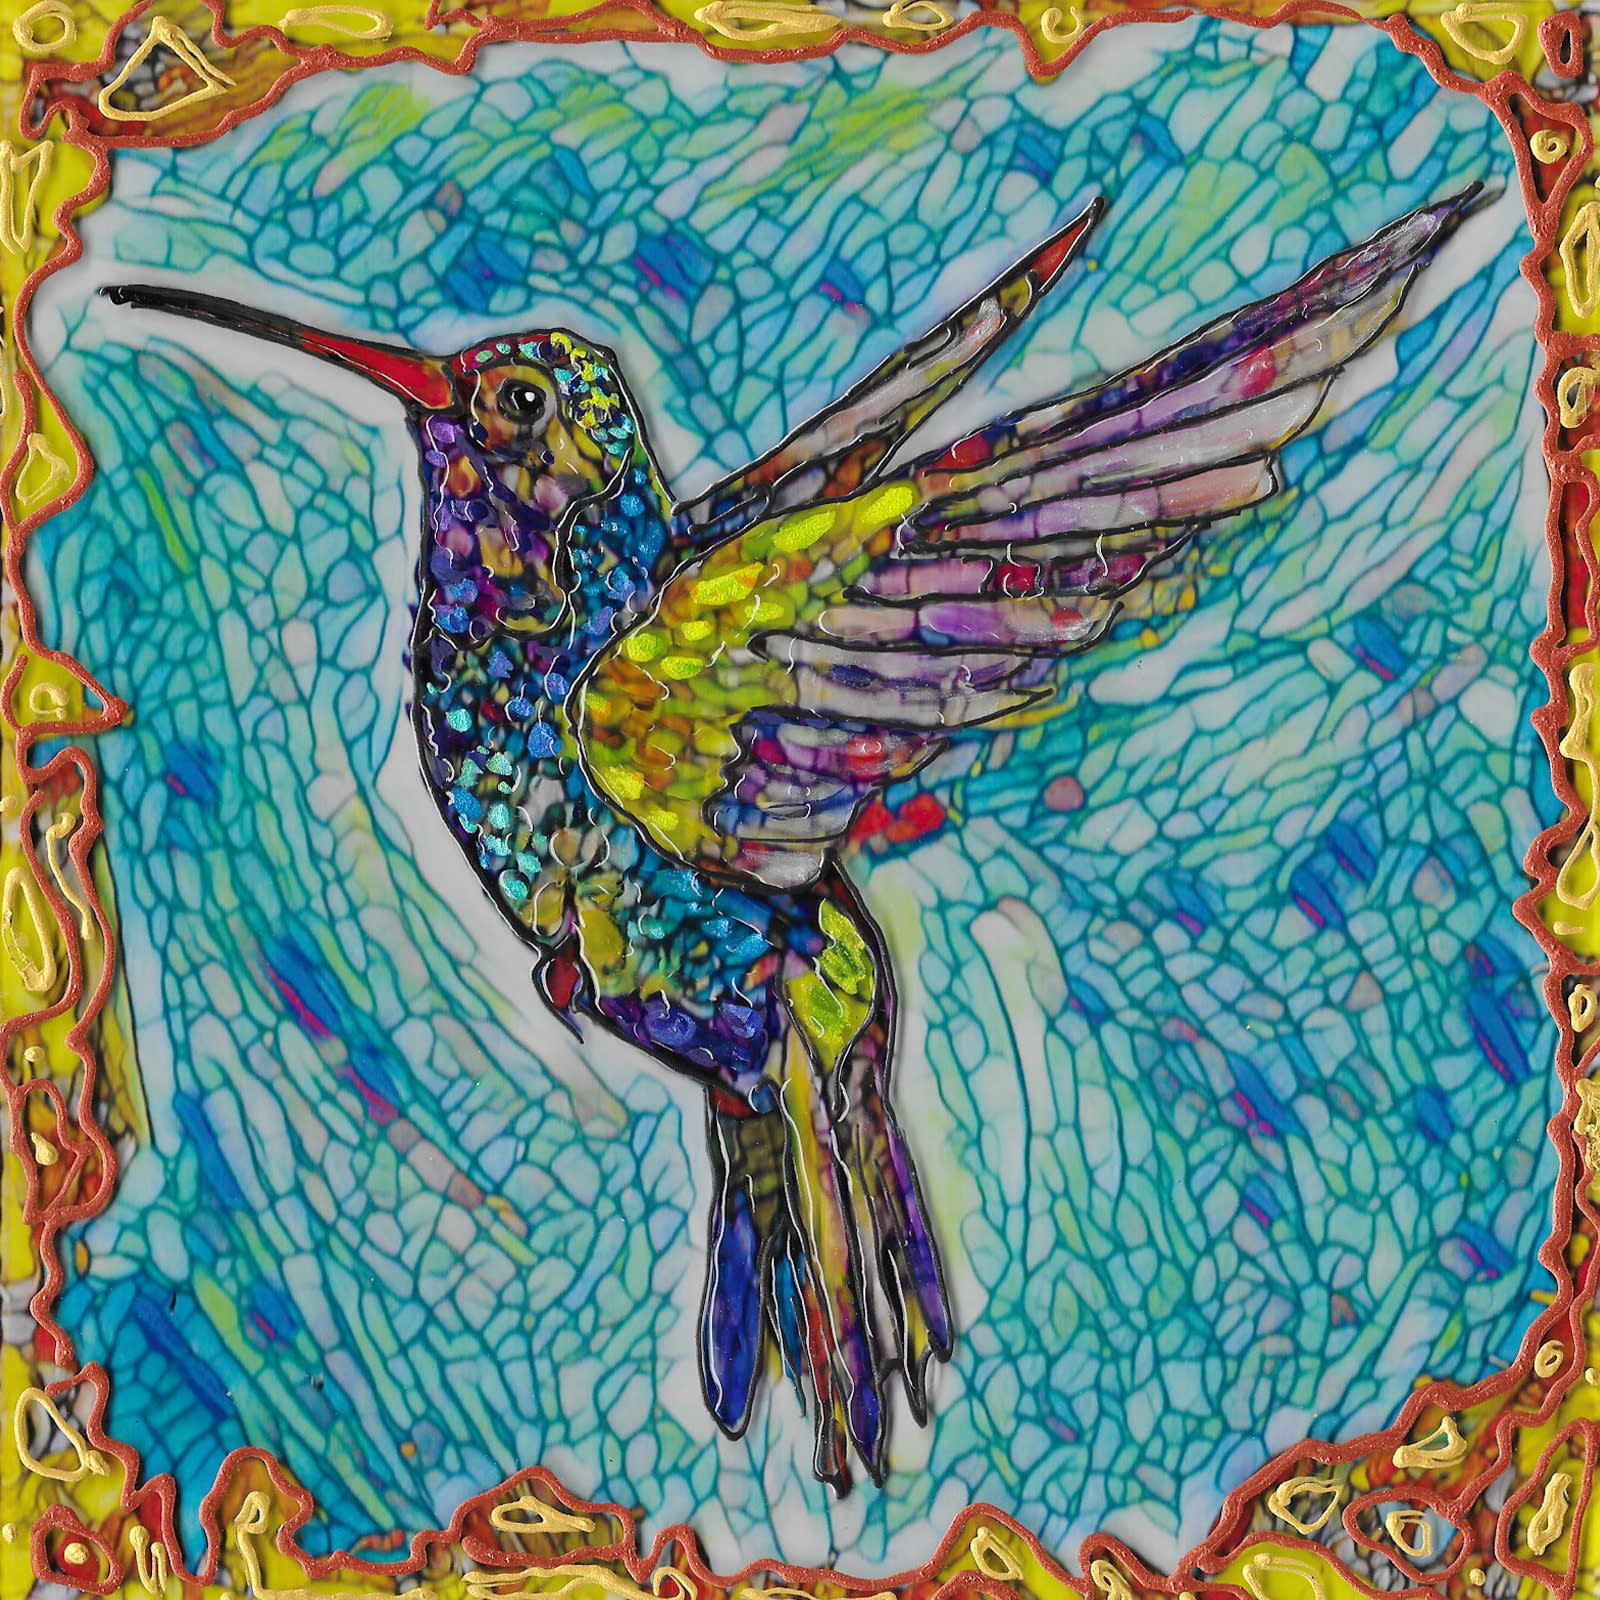 Flying hummer 3 on acrylic bxx177